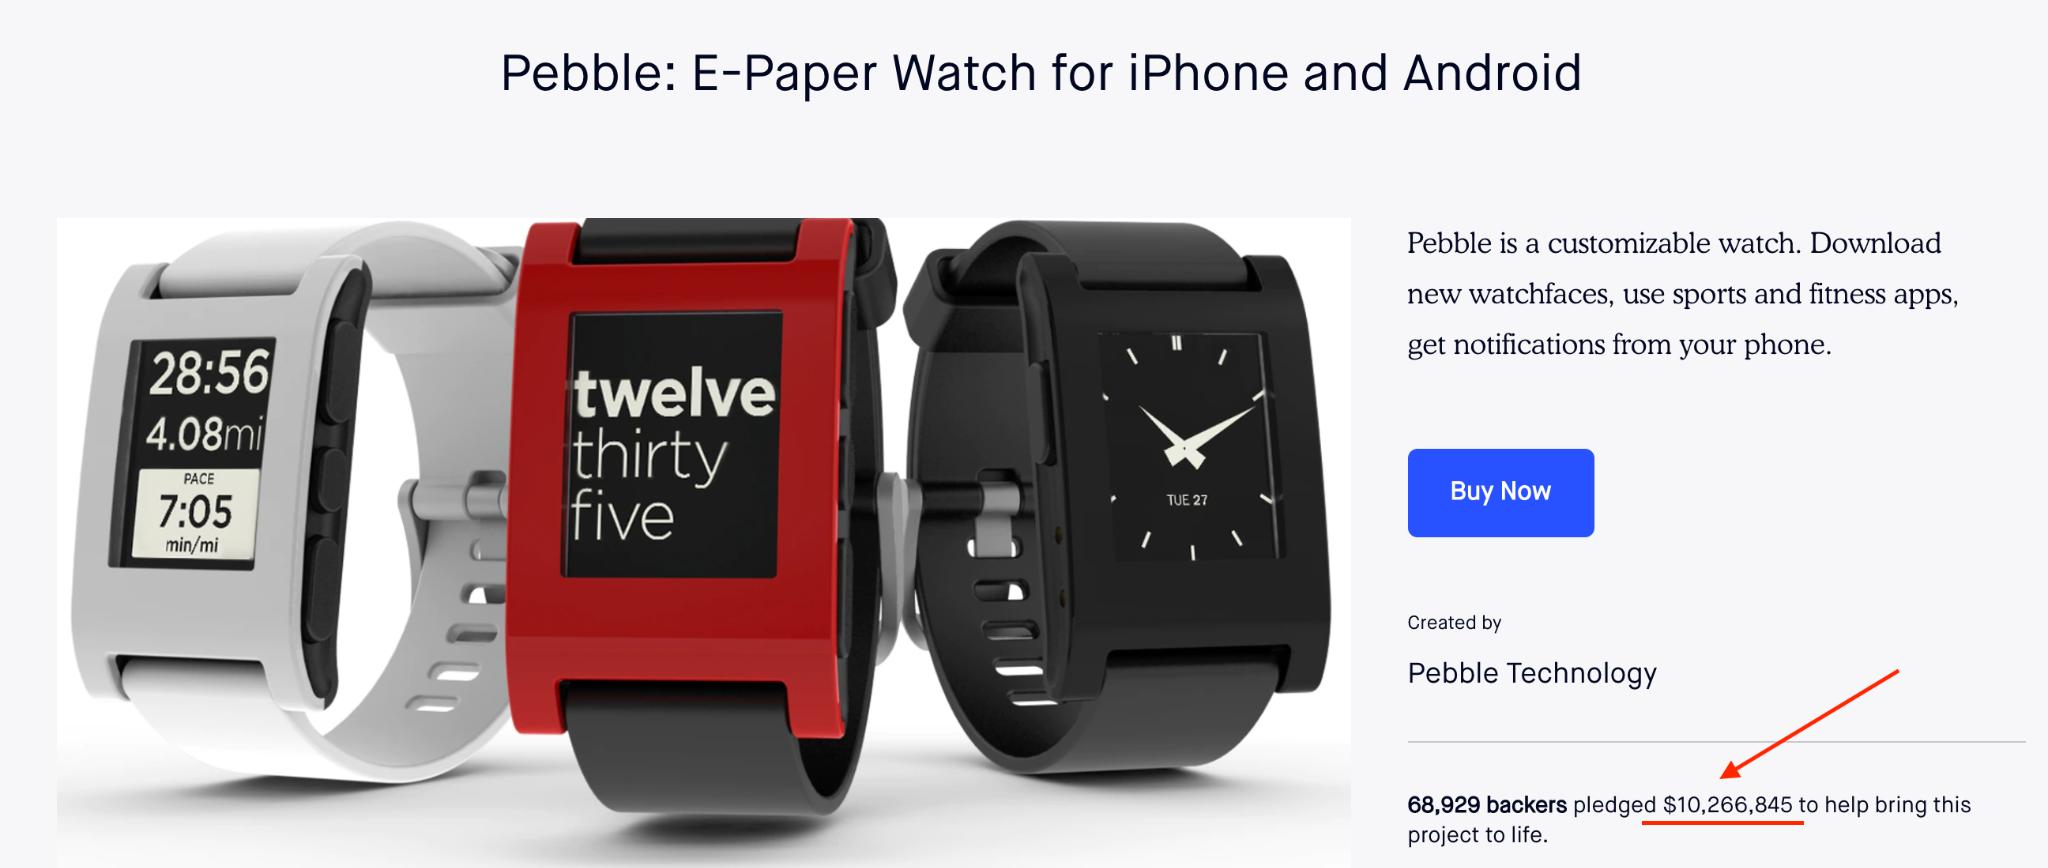 An MVP example of Pebble's smartwatch